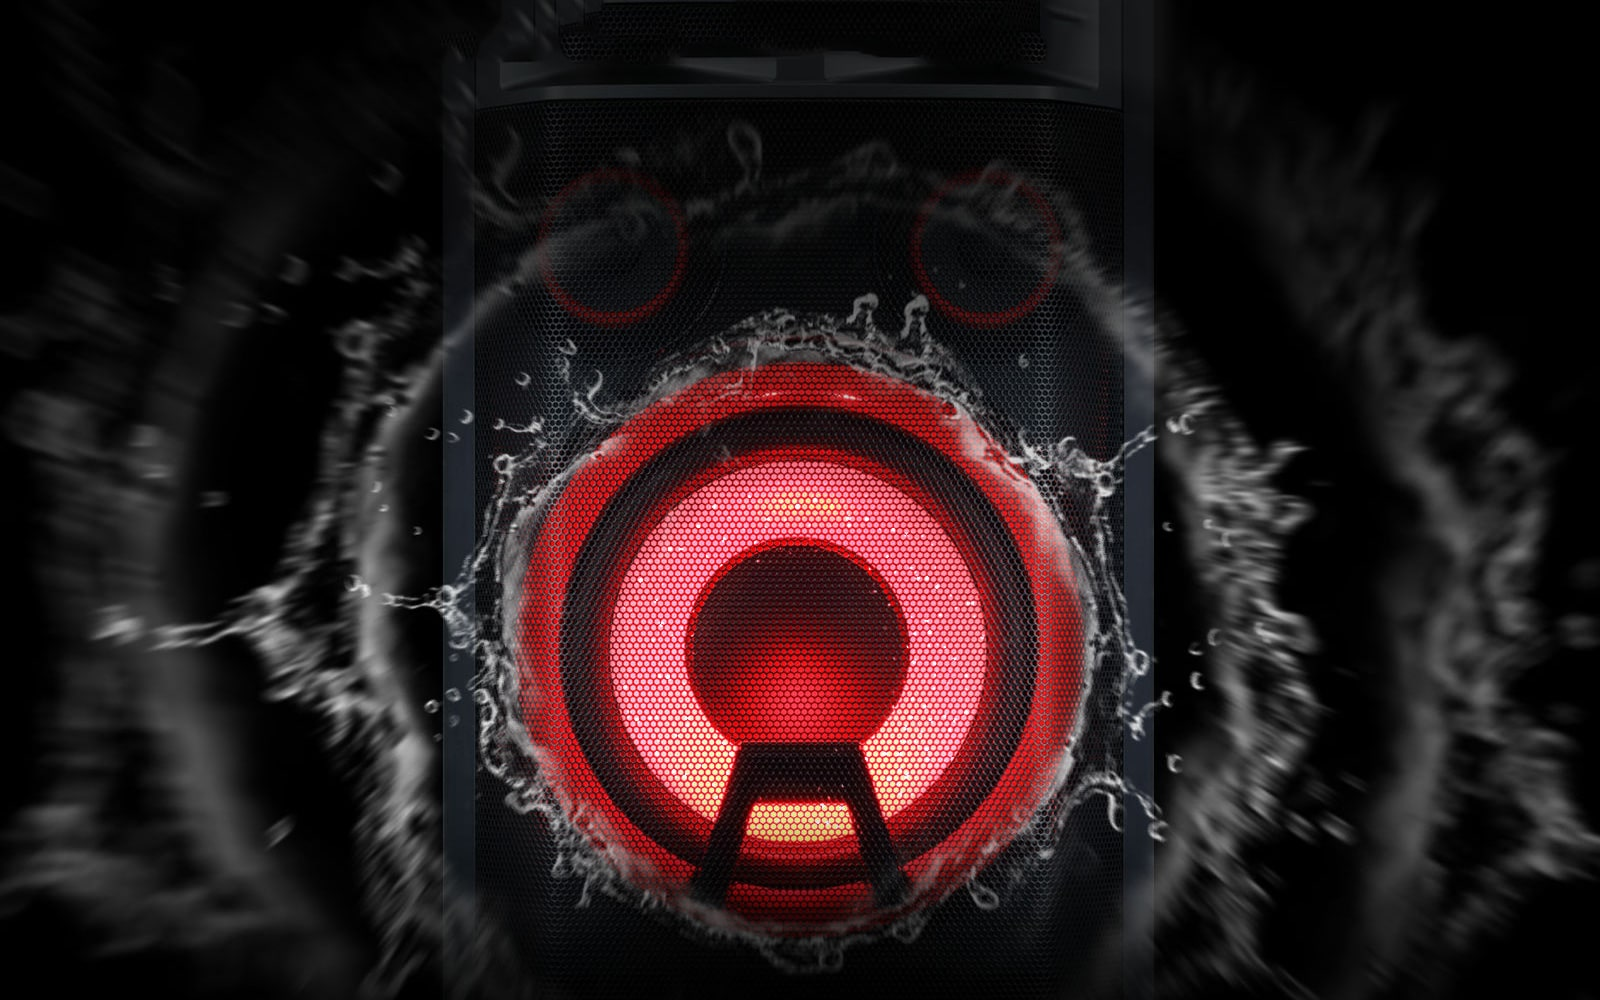 LG 1000 Watts RMS, Blast Horn, Pro DJ Wheel, Vocal Effects